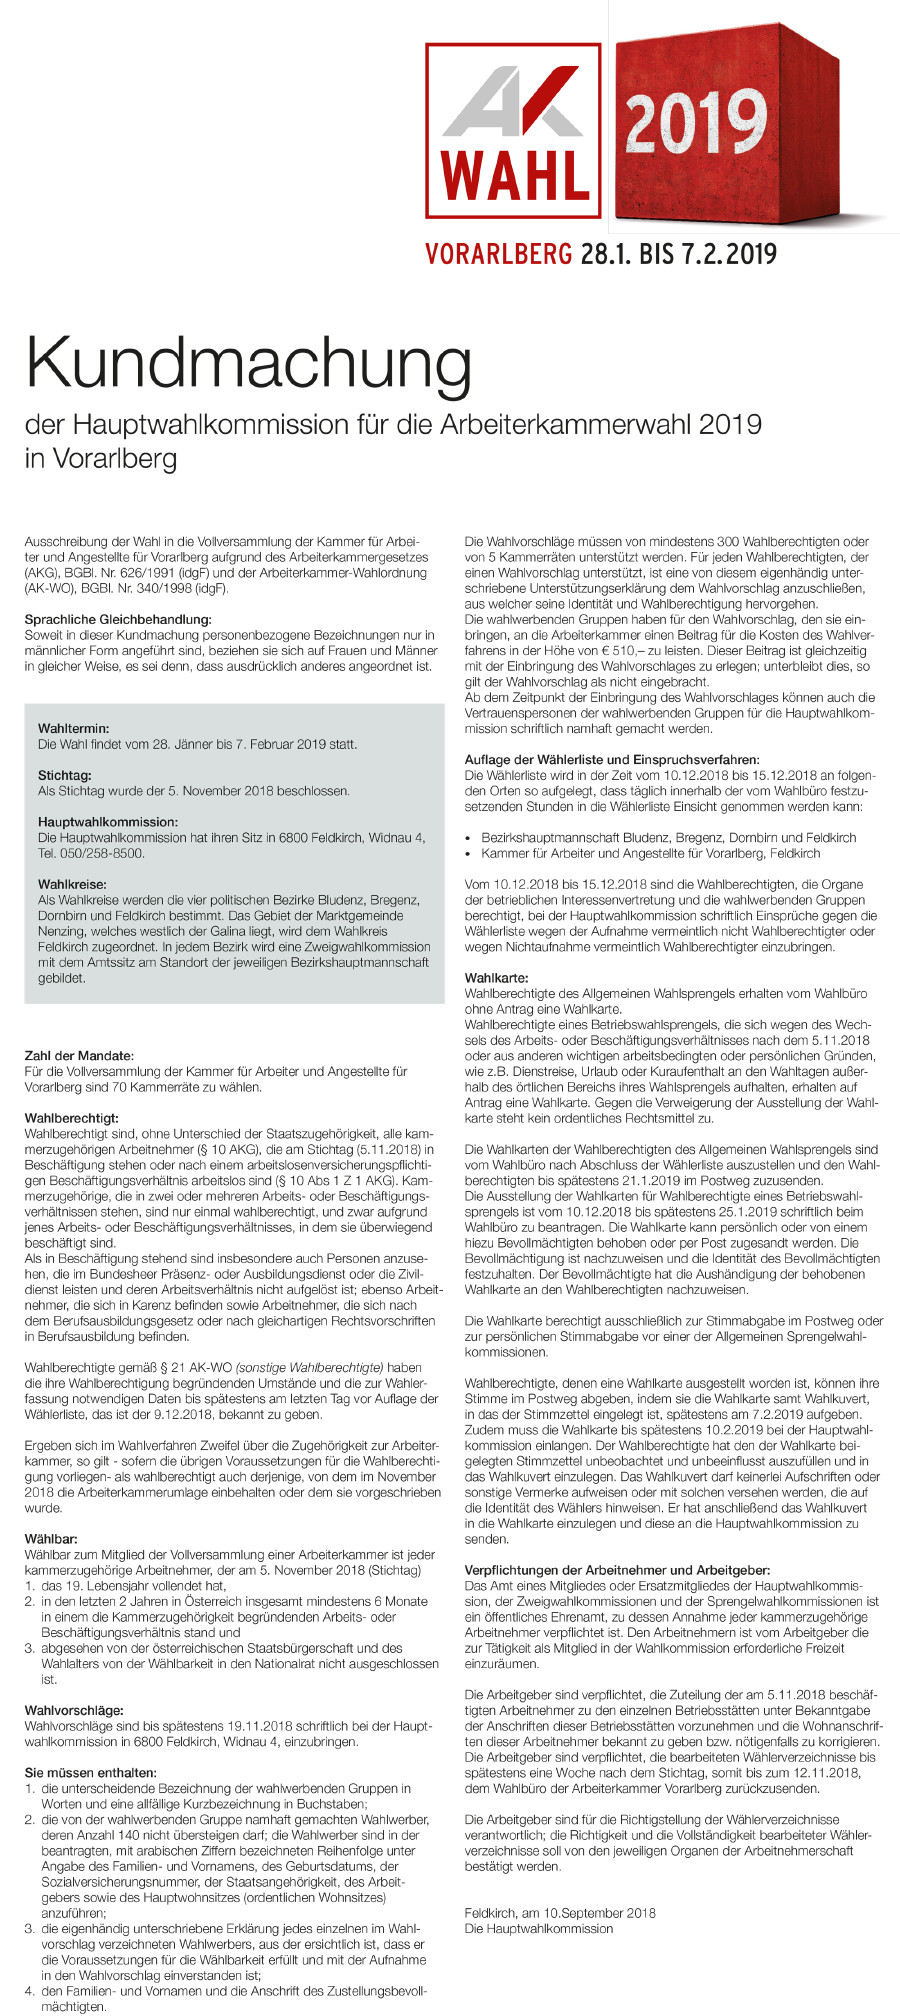 Wahlkundmachung als Bild © pdf Dokument